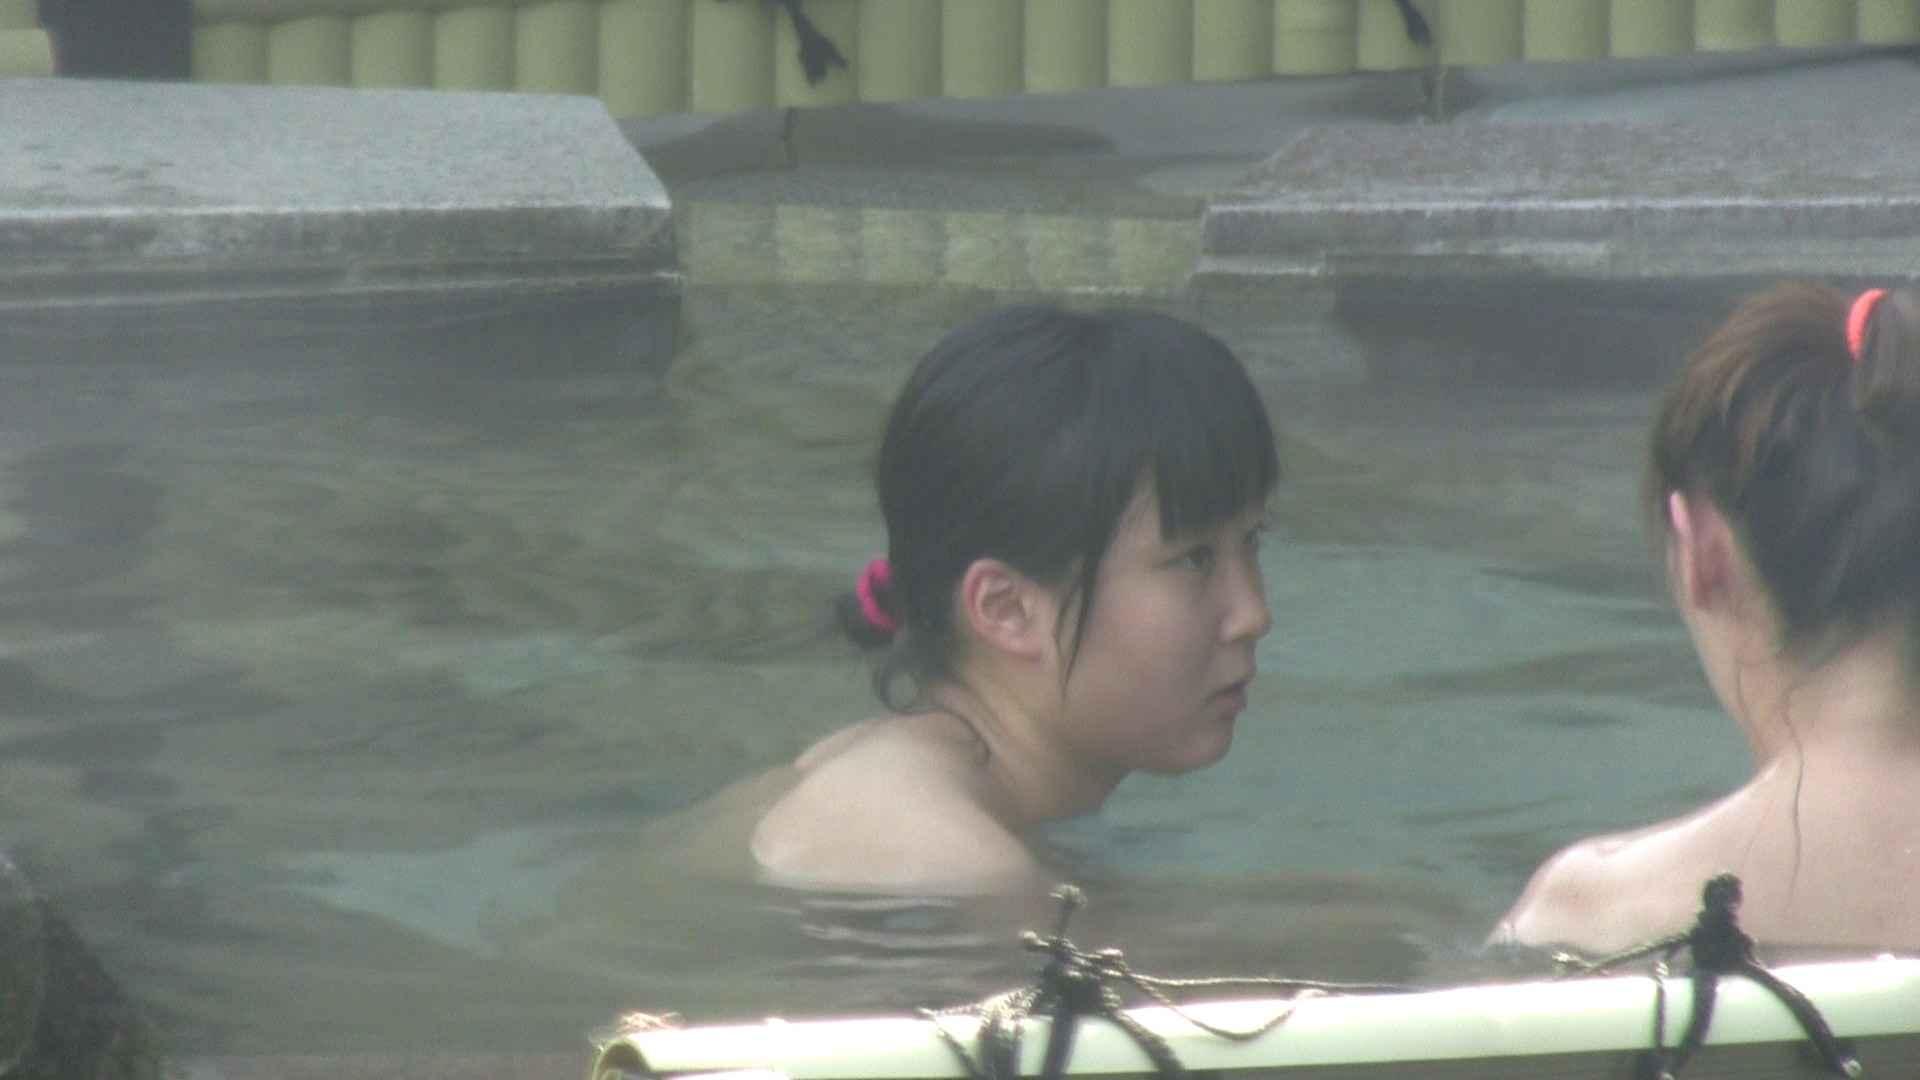 Aquaな露天風呂Vol.196 HなOL | 盗撮  91pic 84